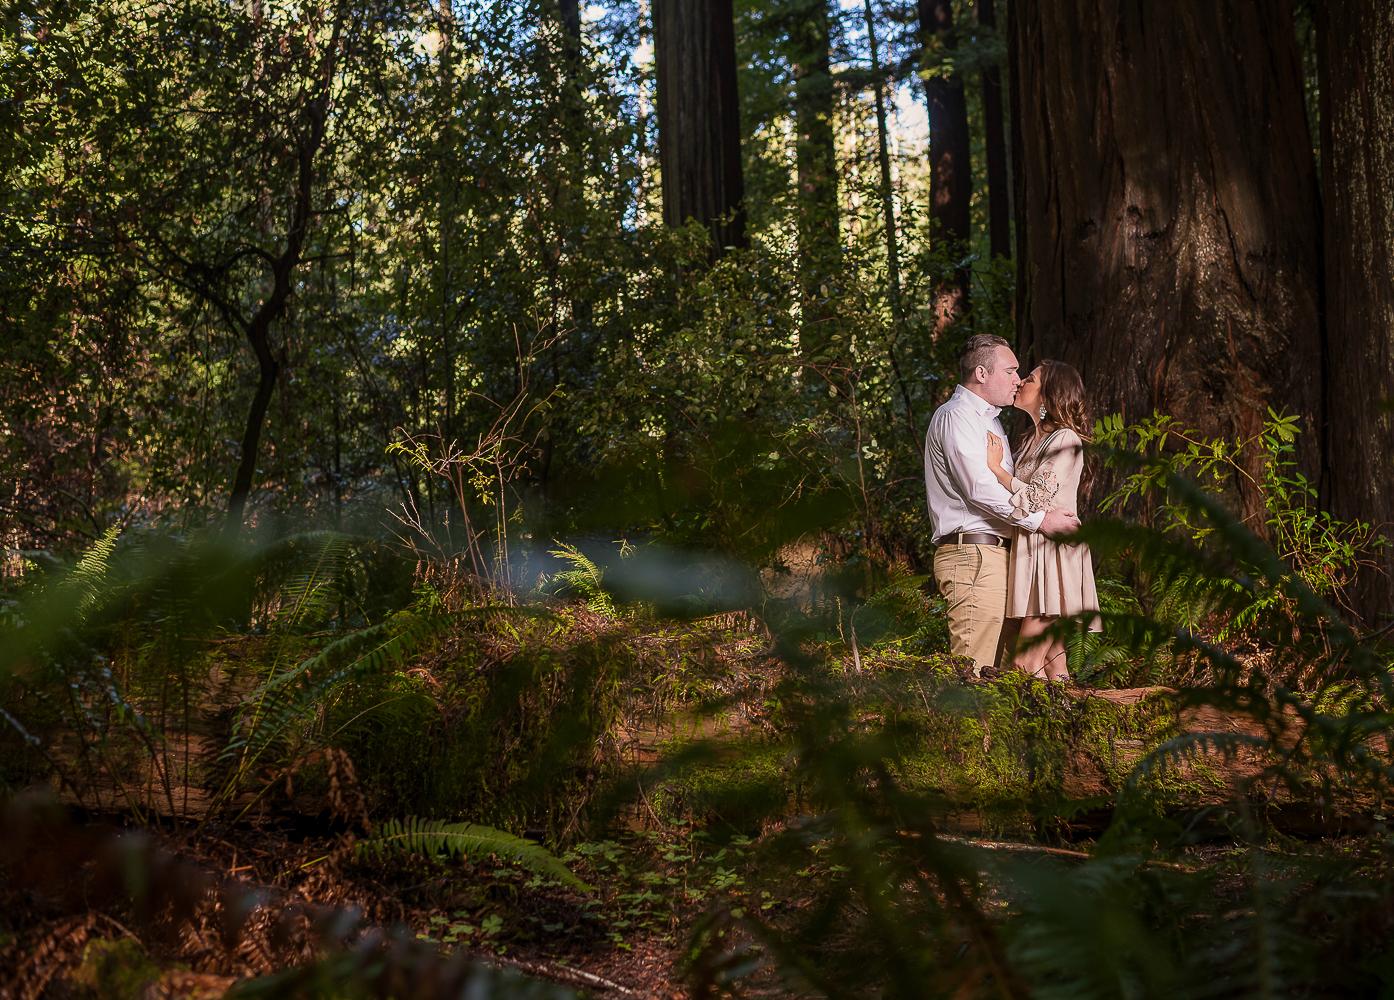 Parky's Pics Wedding & Portrait Photography 2017-Humboldt County Wedding Photographer-4.jpg